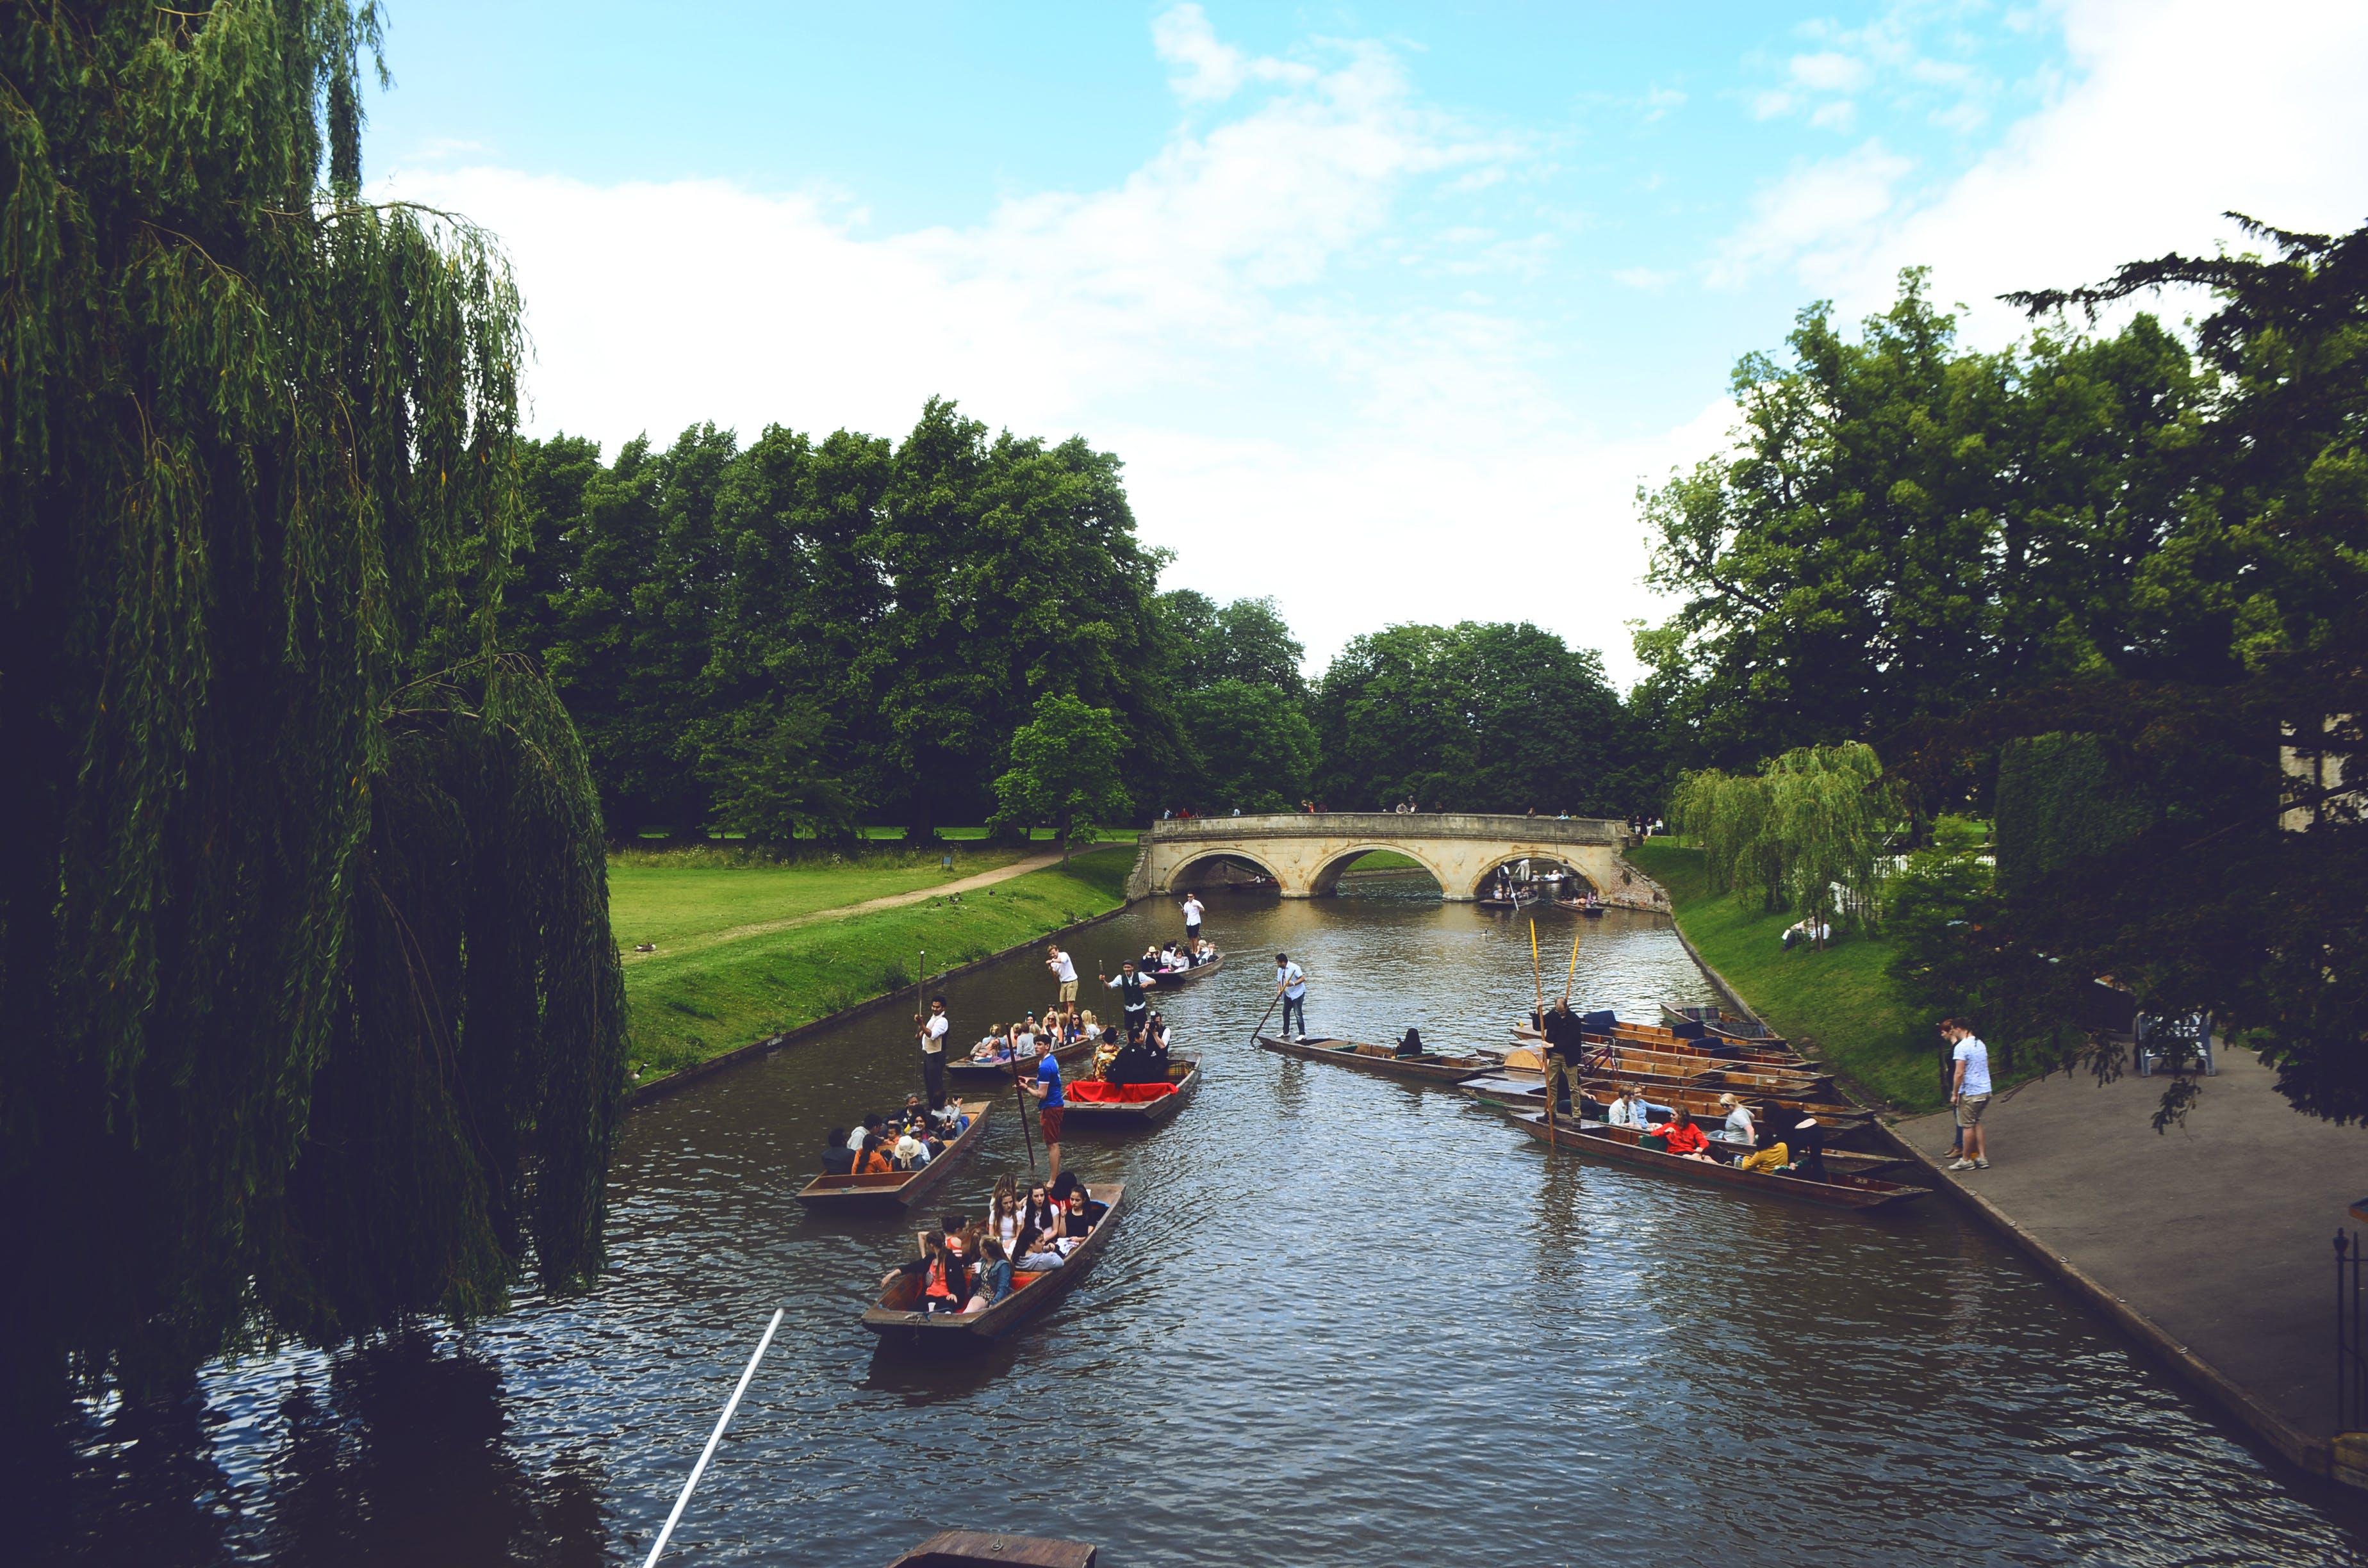 Group of People Ride on Jon Boats Near Bridge